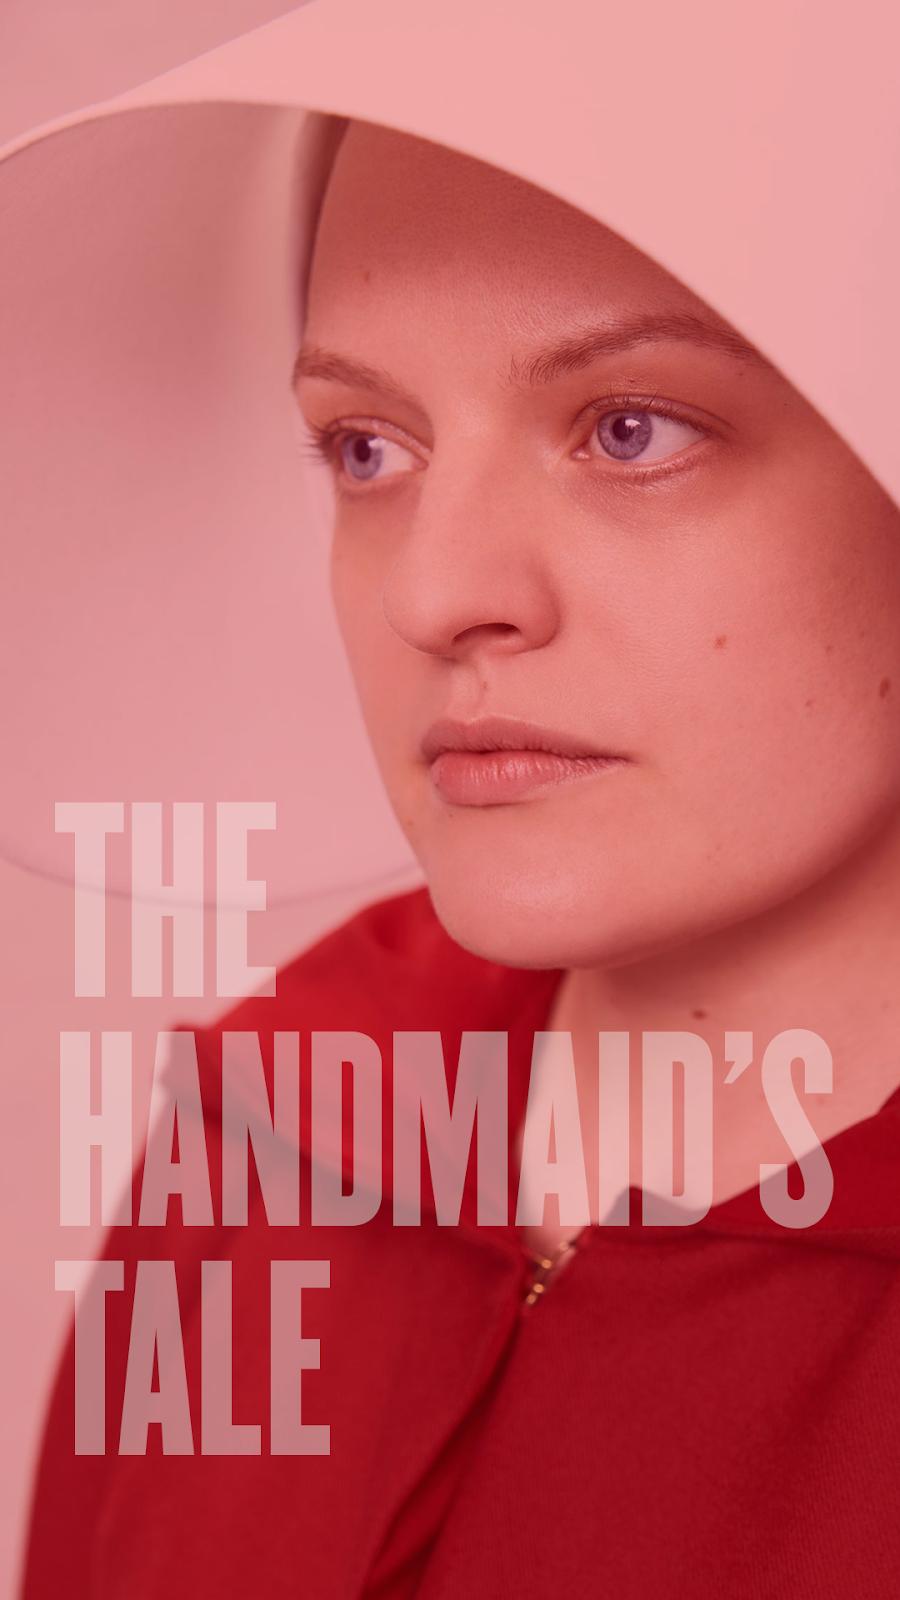 The Handmaid's Tale Brasil